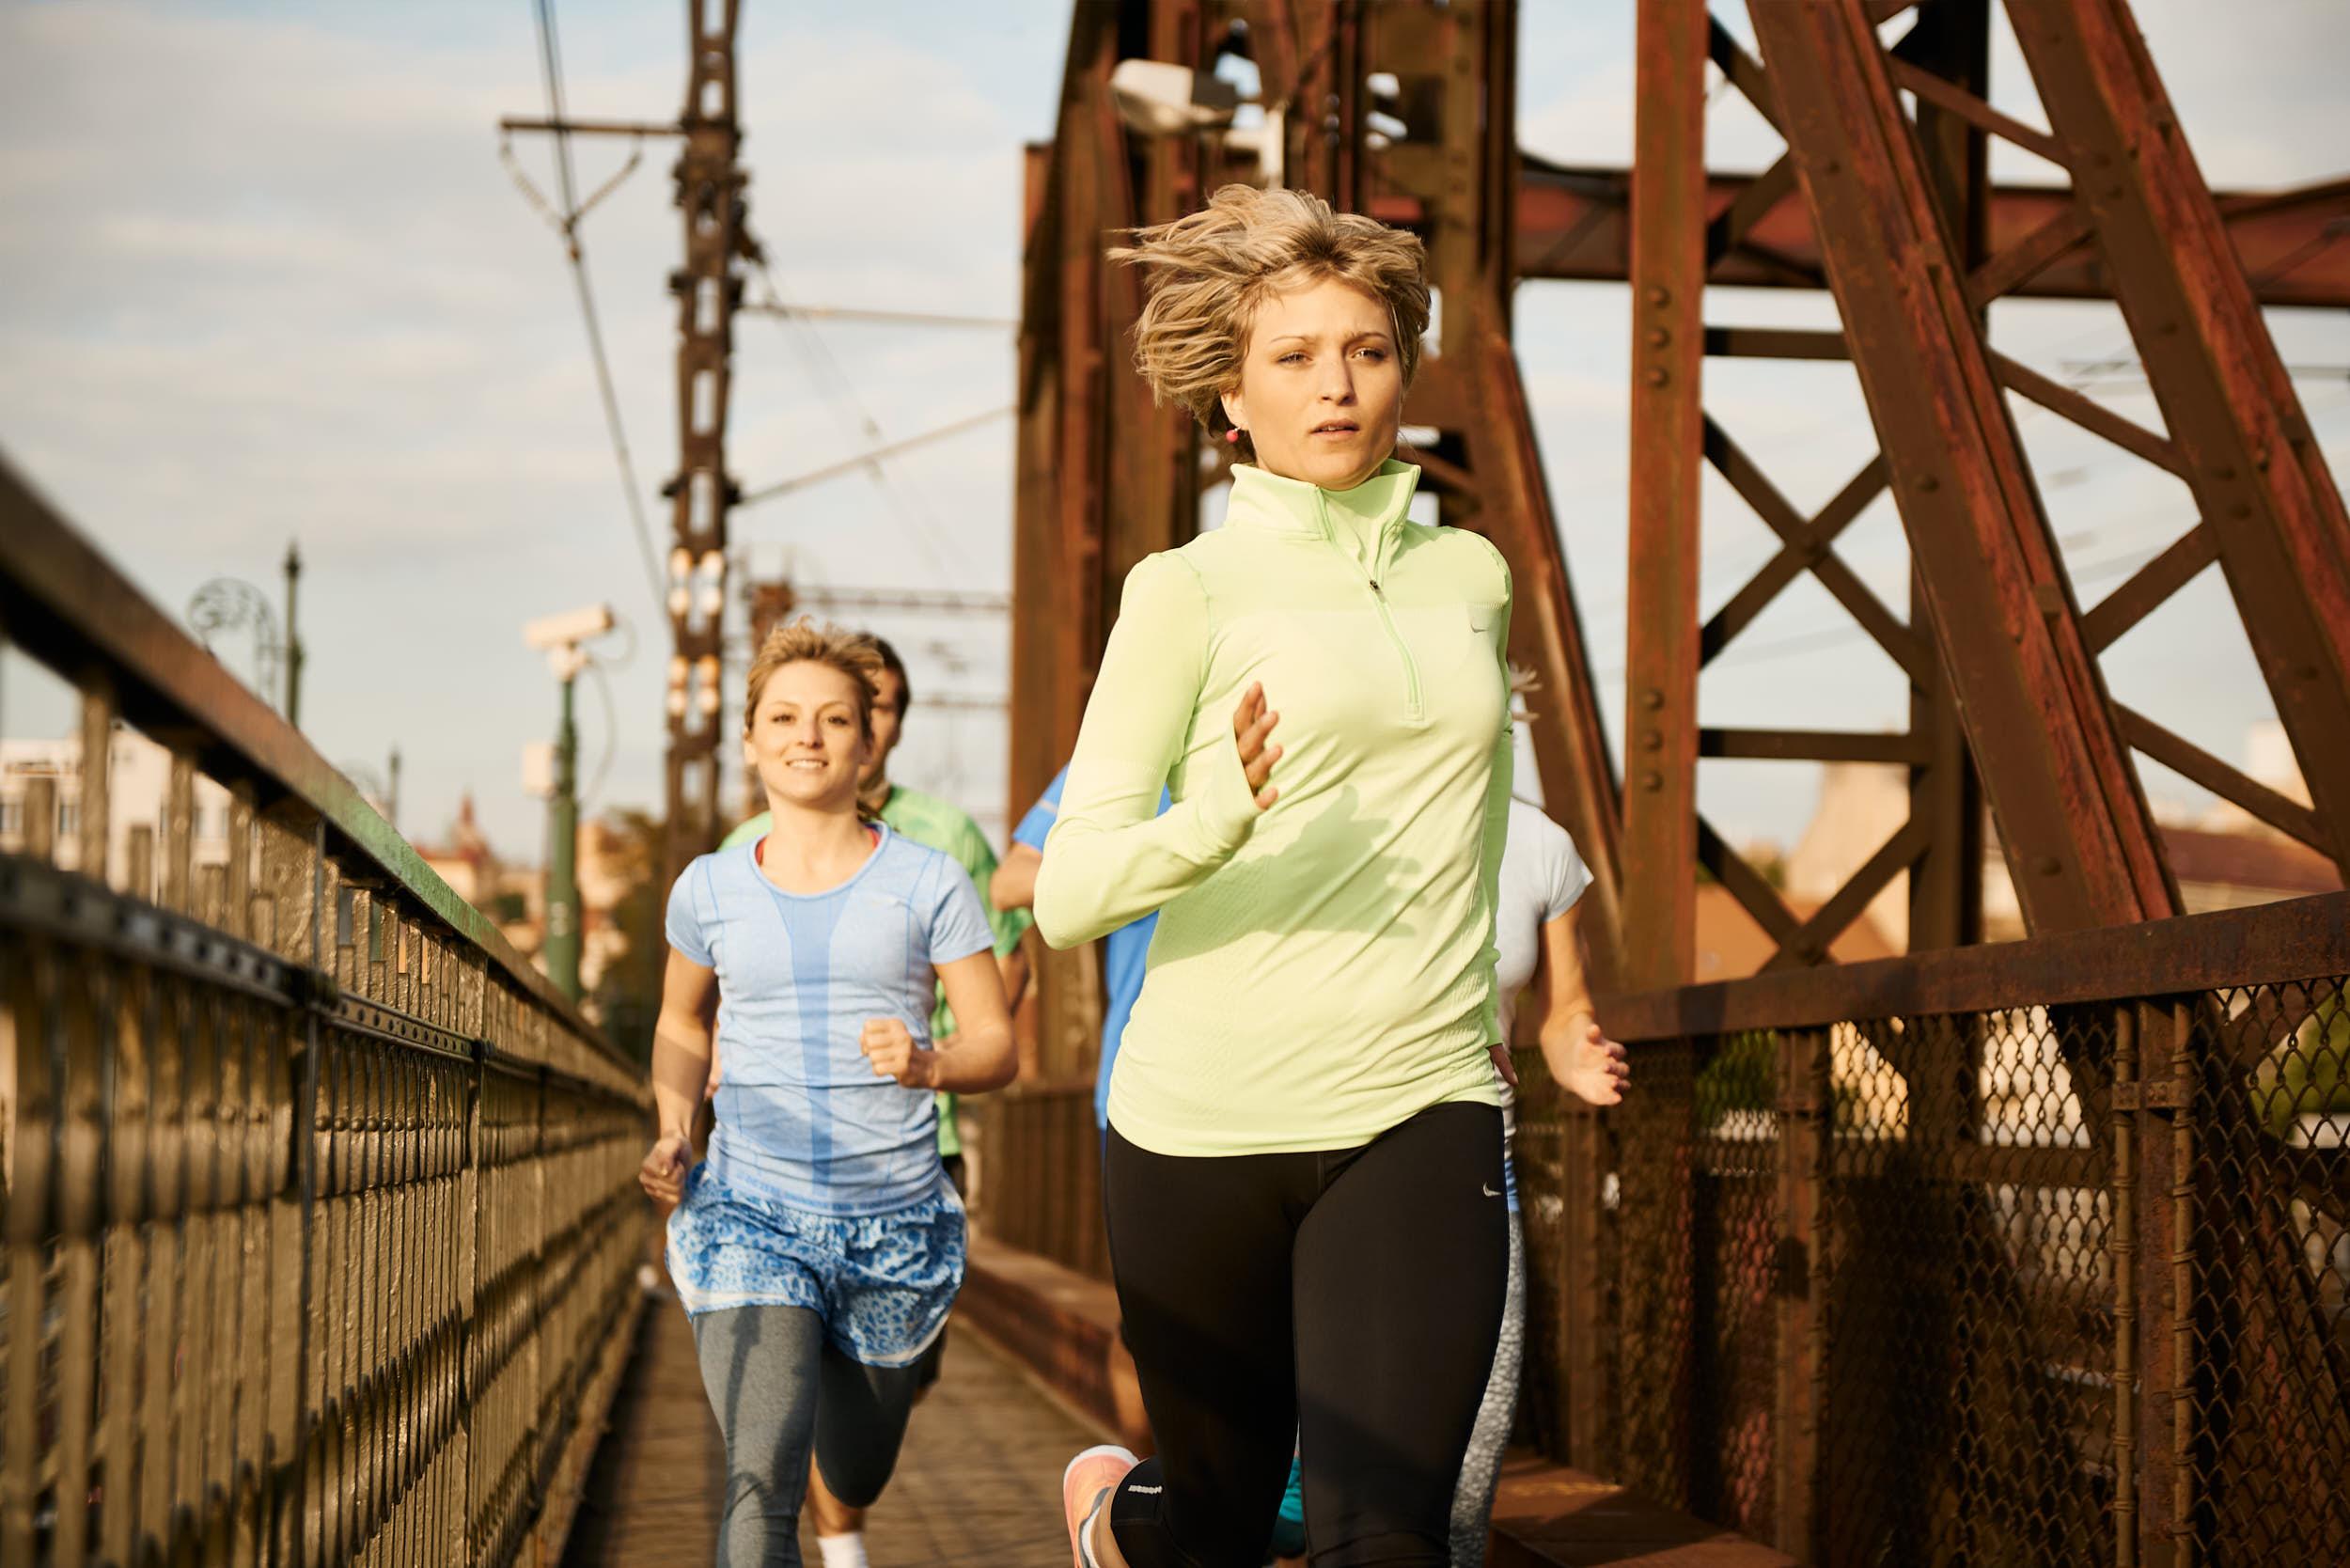 Group of runners on a railway bridge.